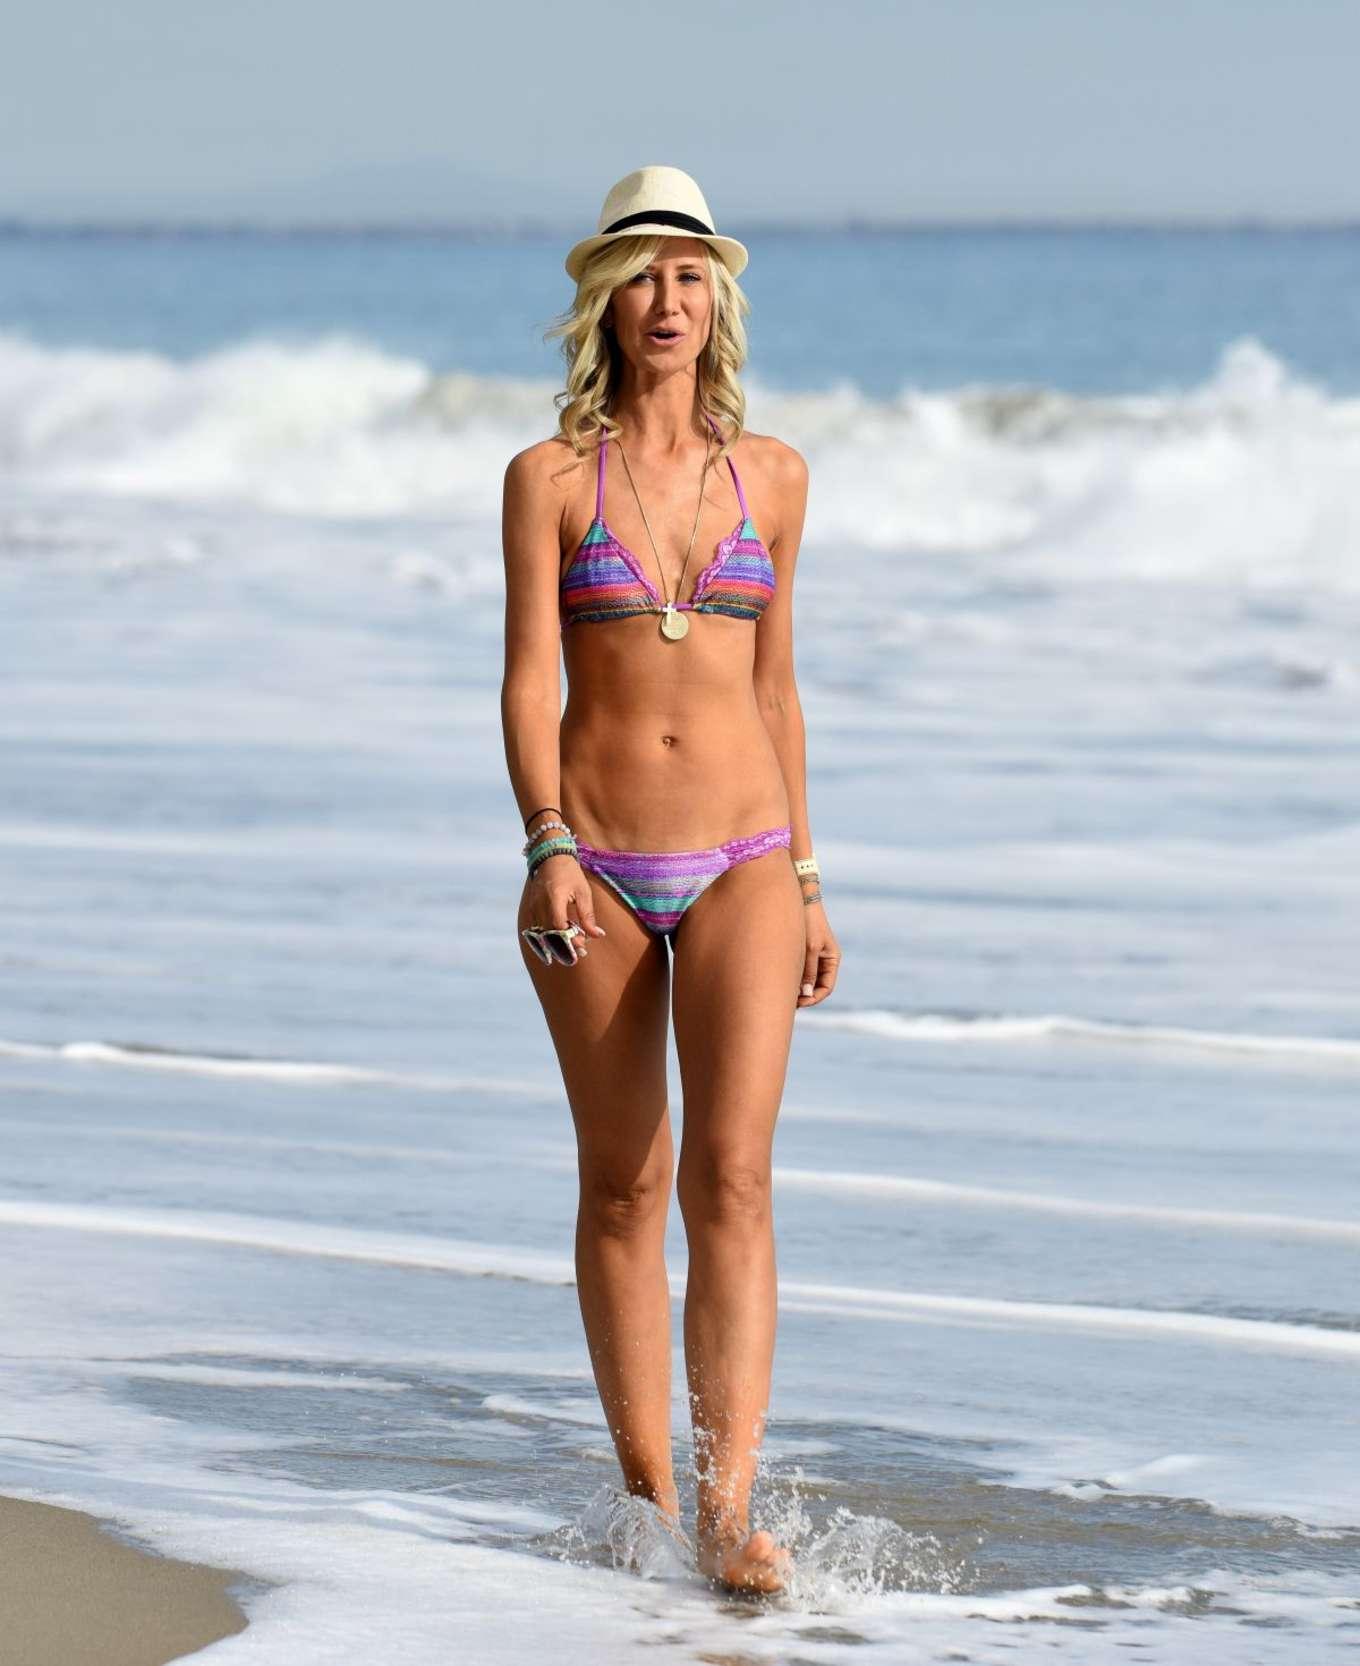 Lady Victoria Hervey 2017 : Lady Victoria Hervey: Bikini Candids -01